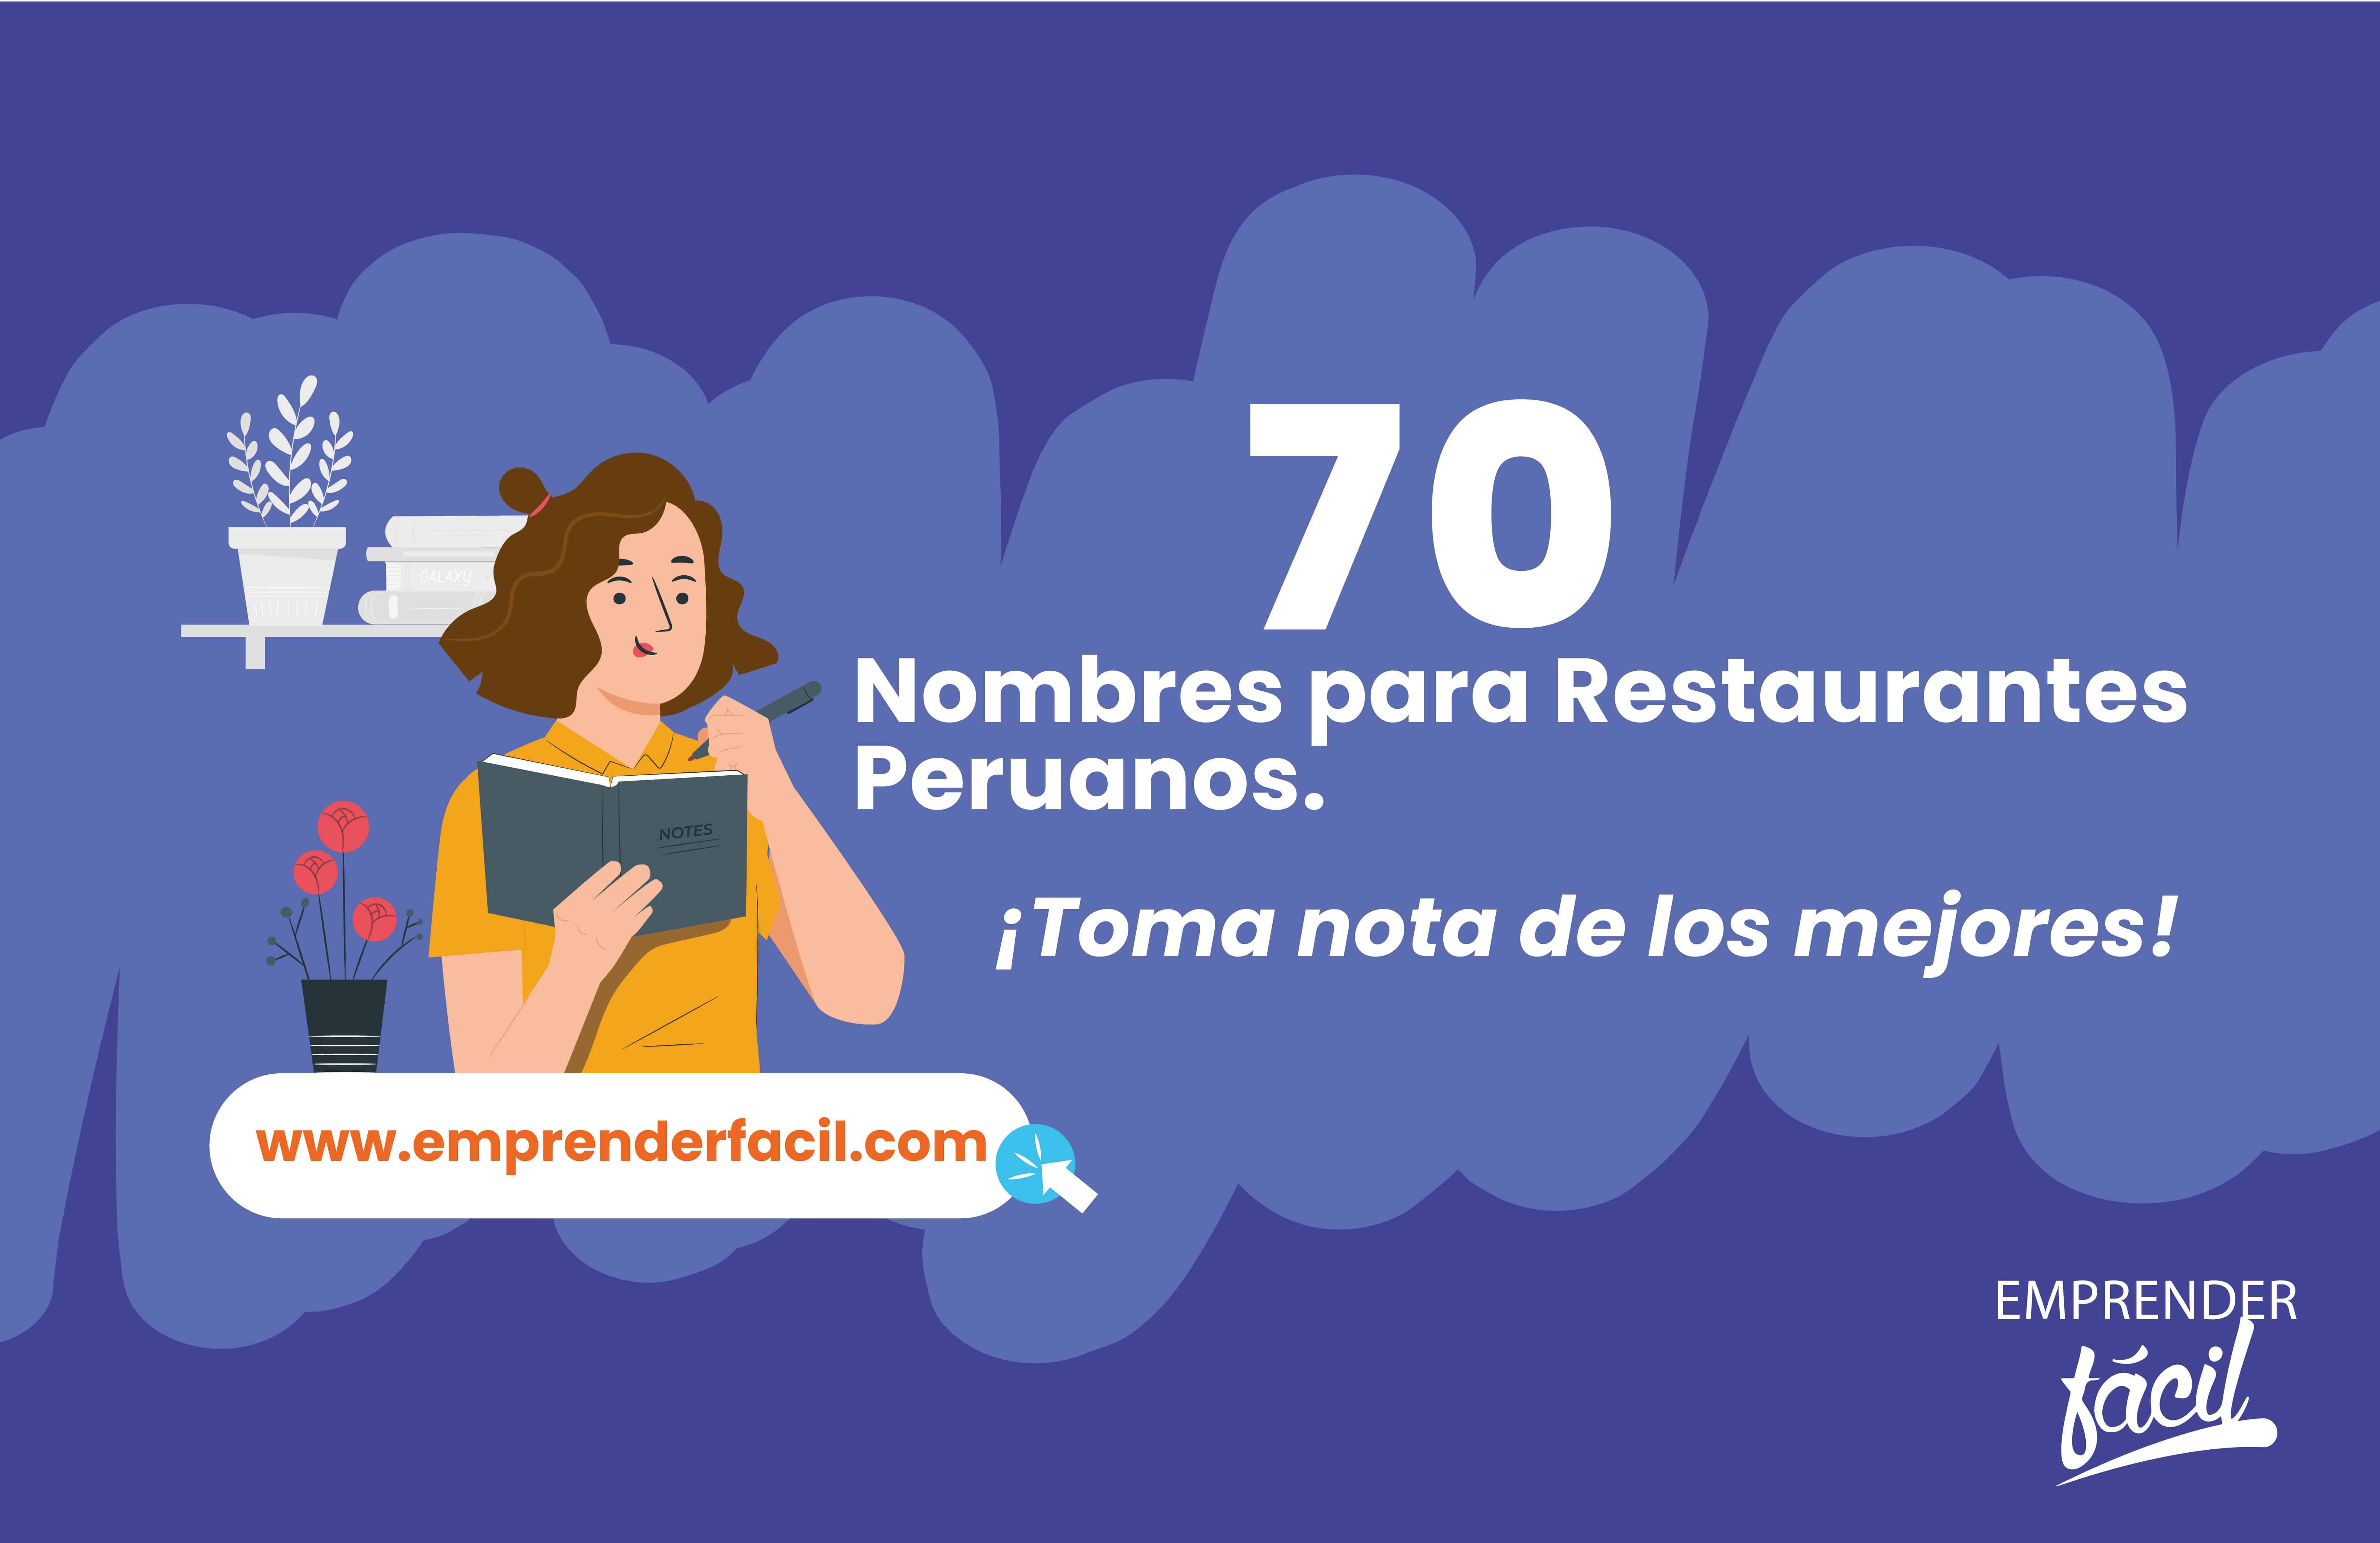 70 Nombres para Restaurantes Peruanos ¡Espectaculares!